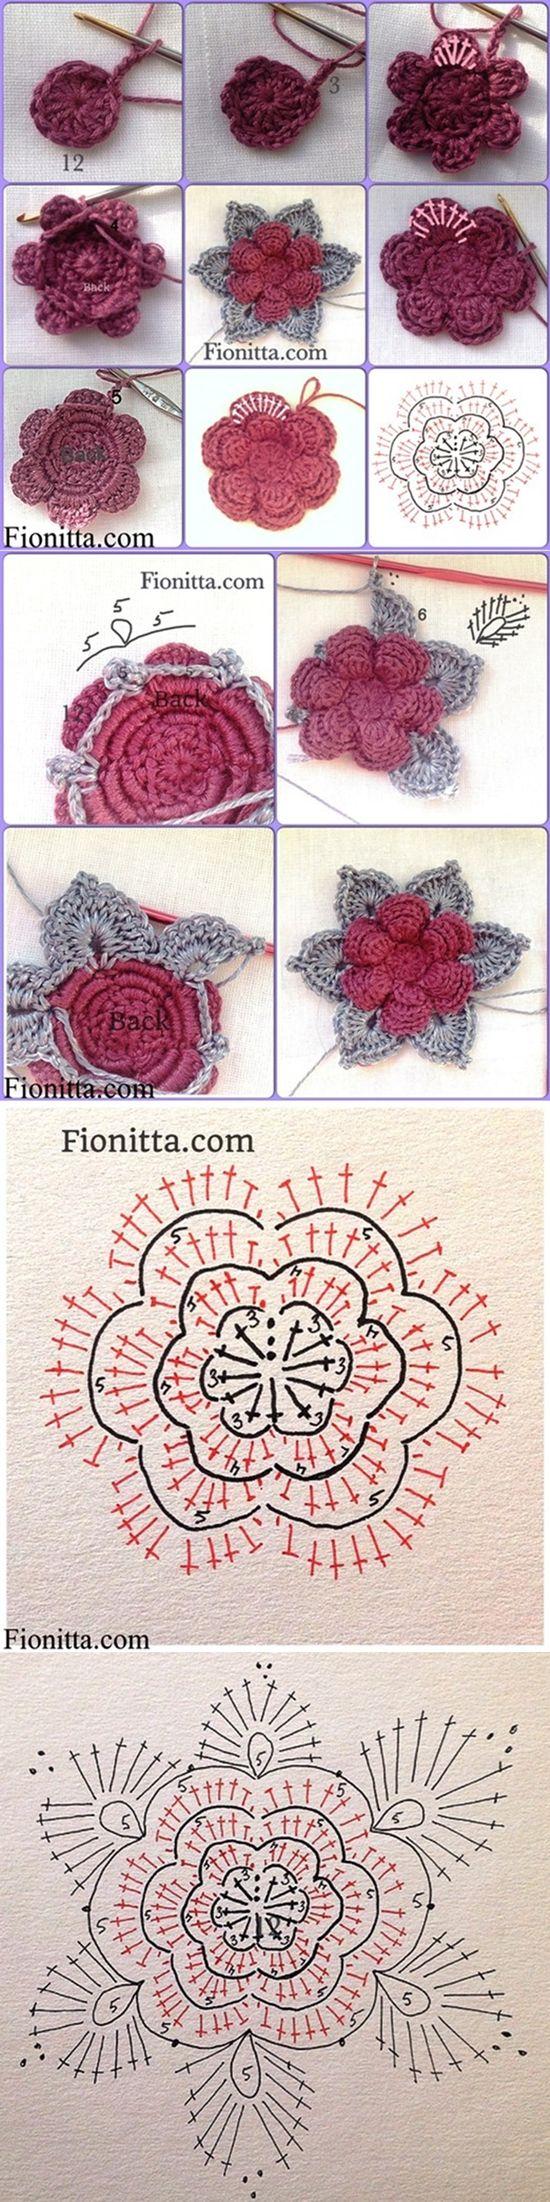 DIY 3D Crochet Rose